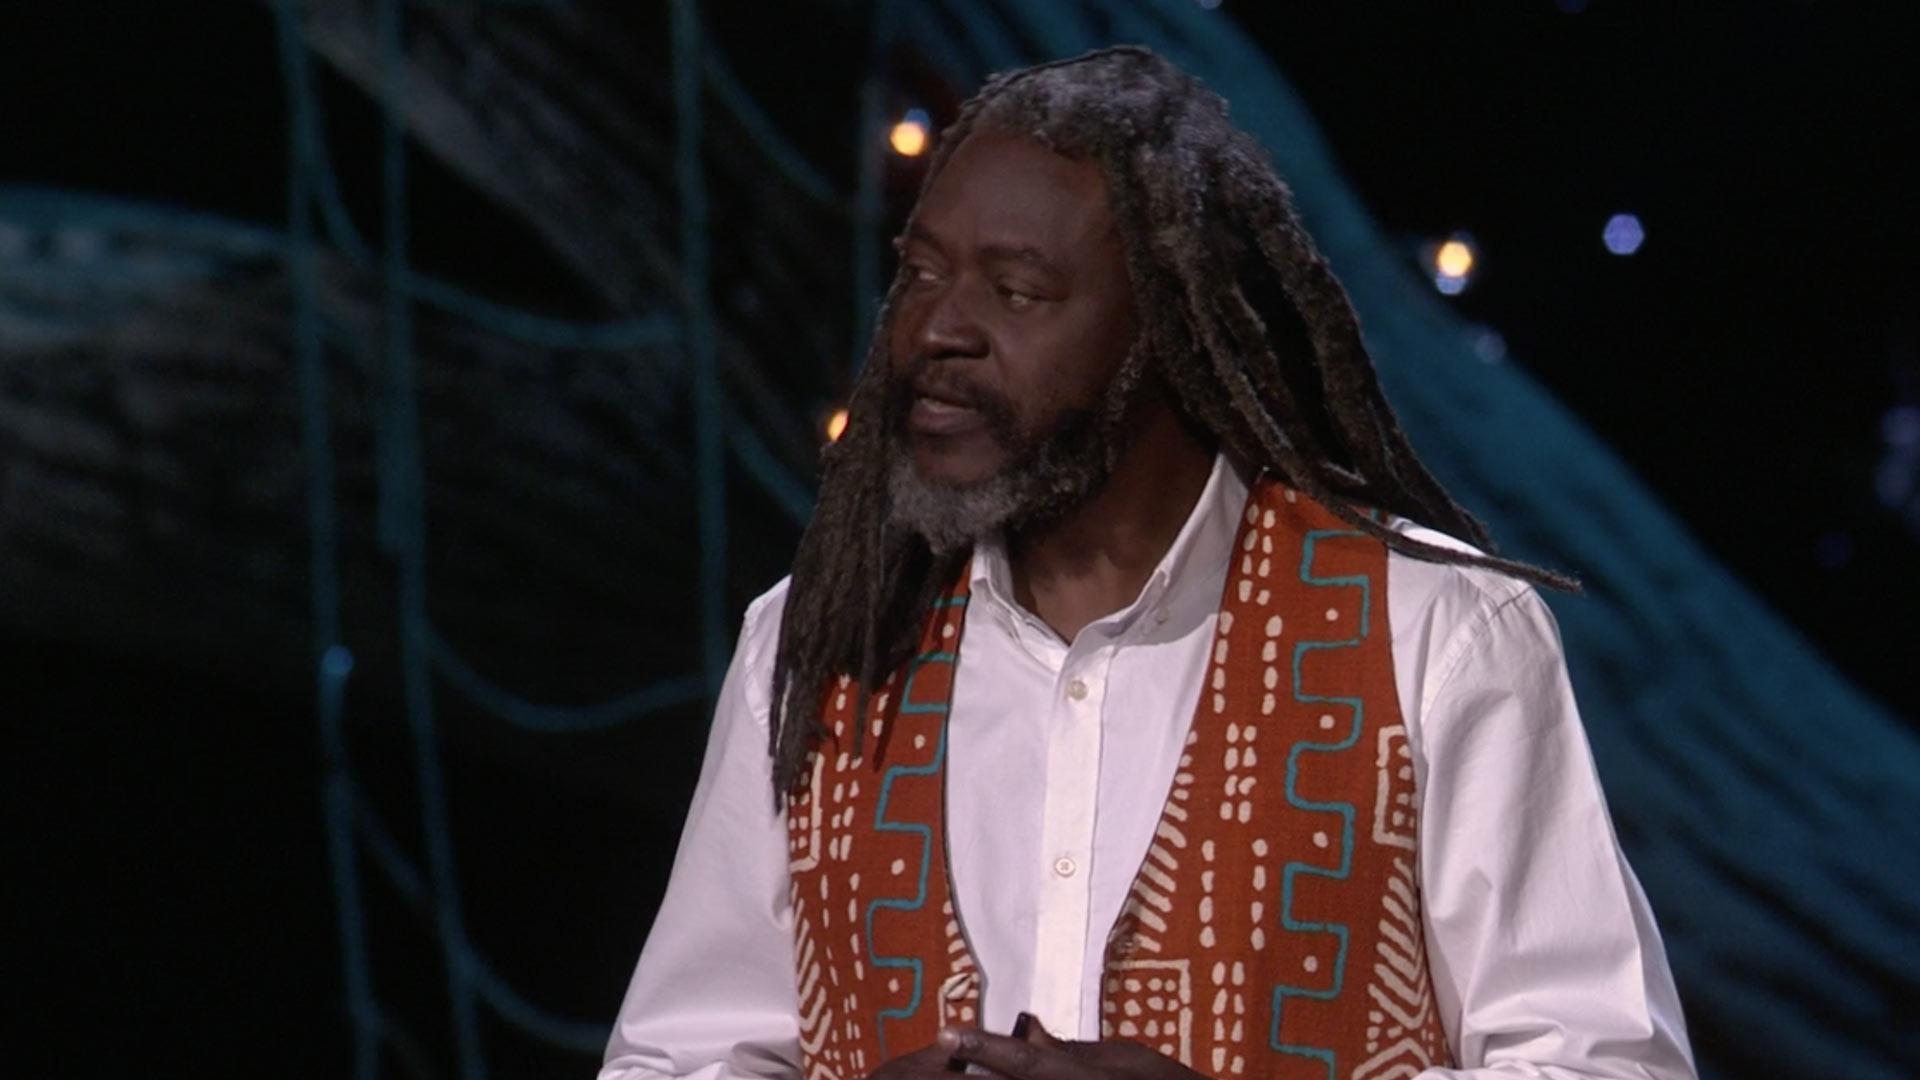 screen shot of Saki Mafundikwa on white shirt ans affican style vest